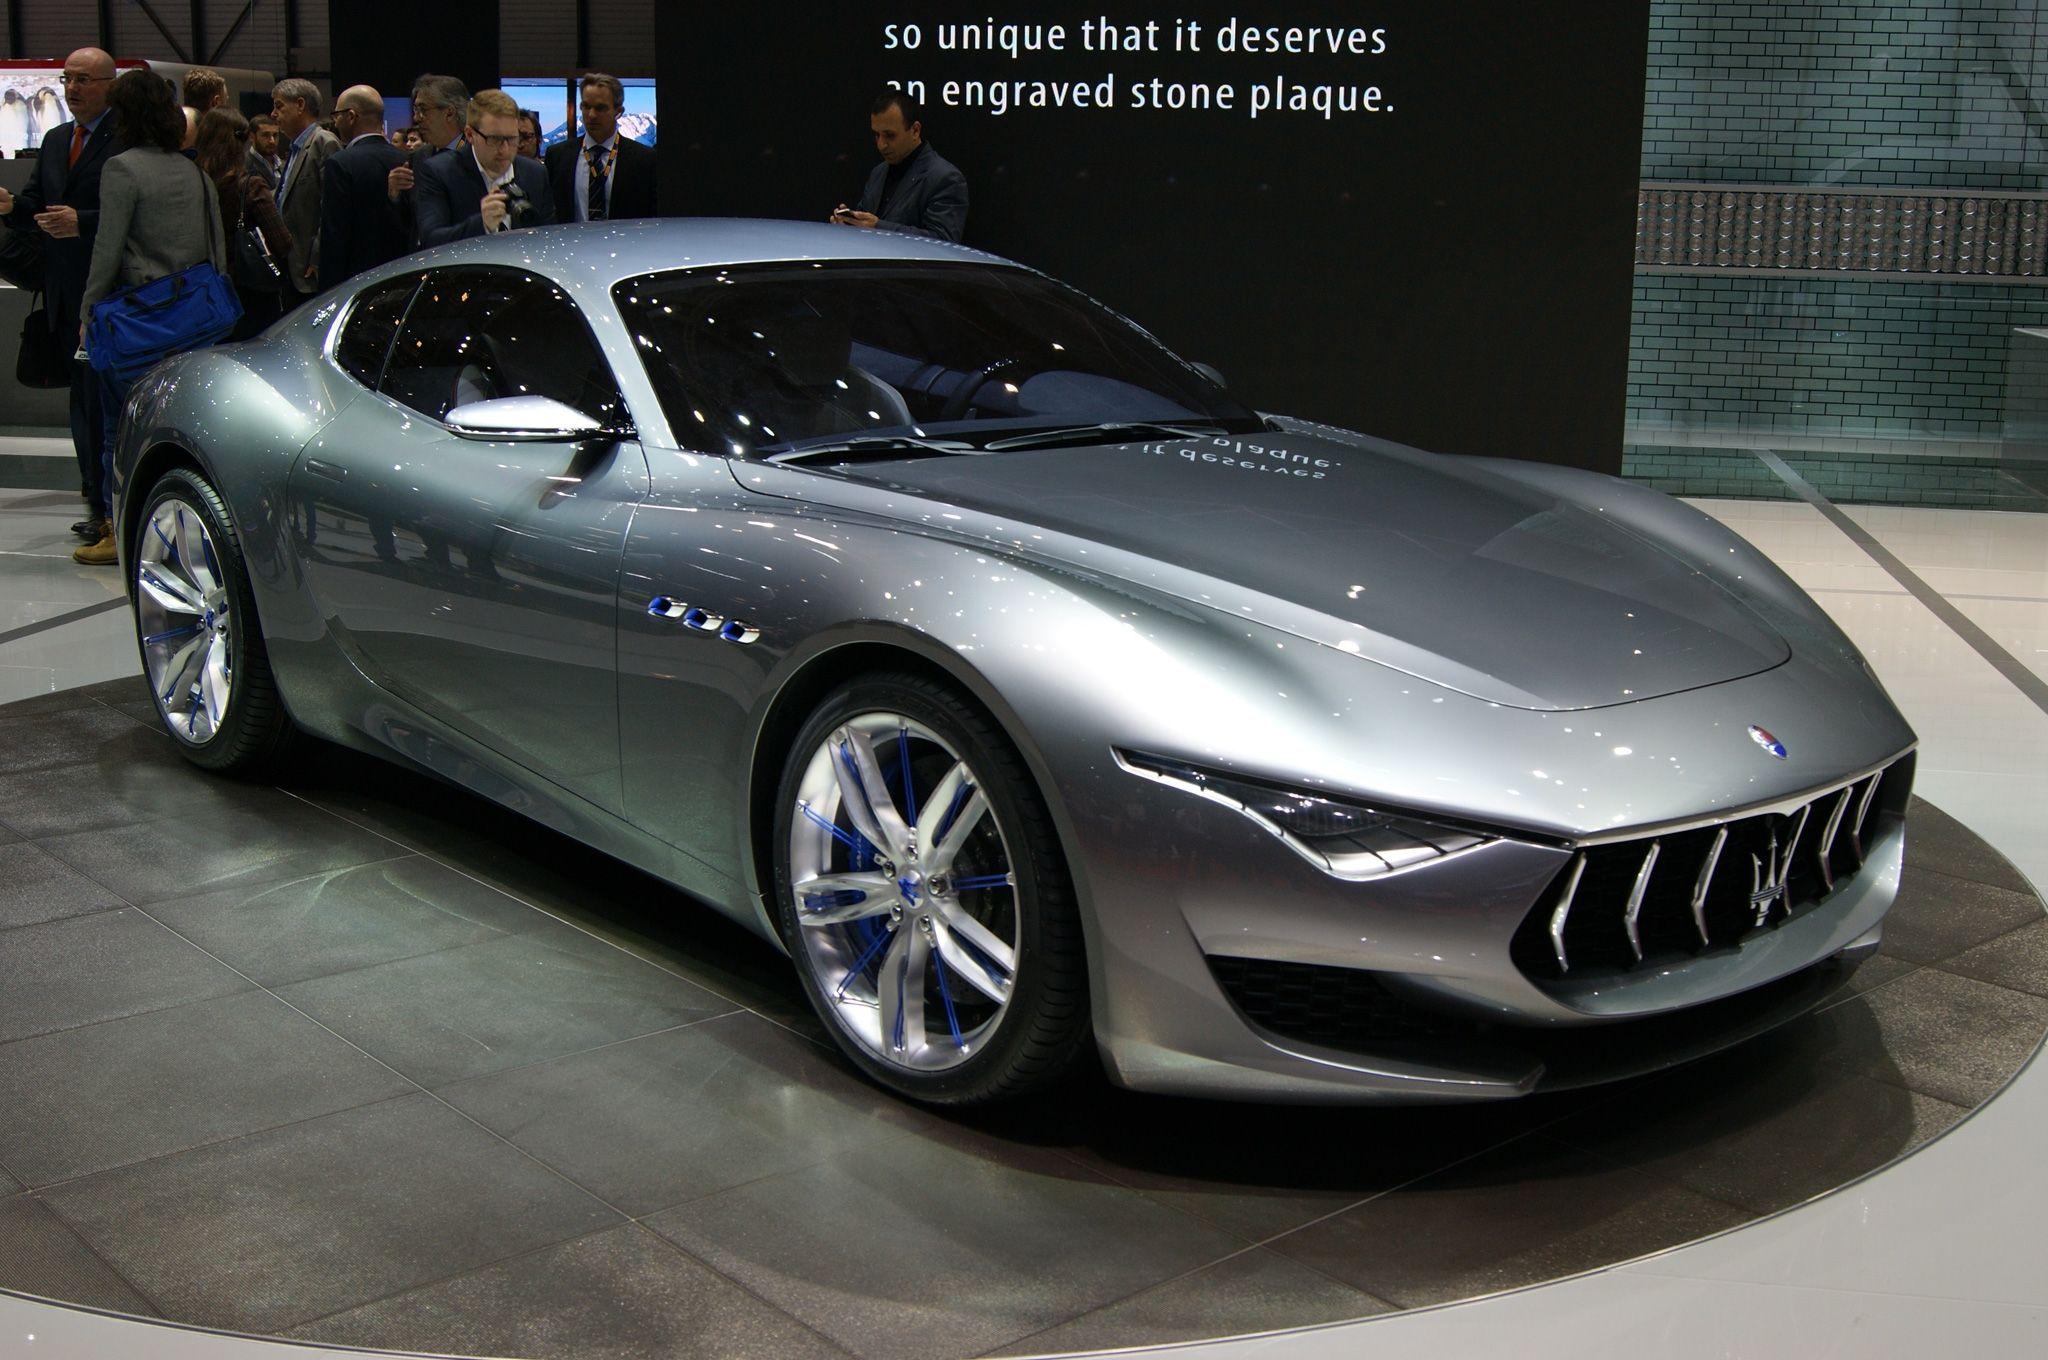 2016 Maserati Granturismo Spec, Picture and Review | Exotic Cars ...